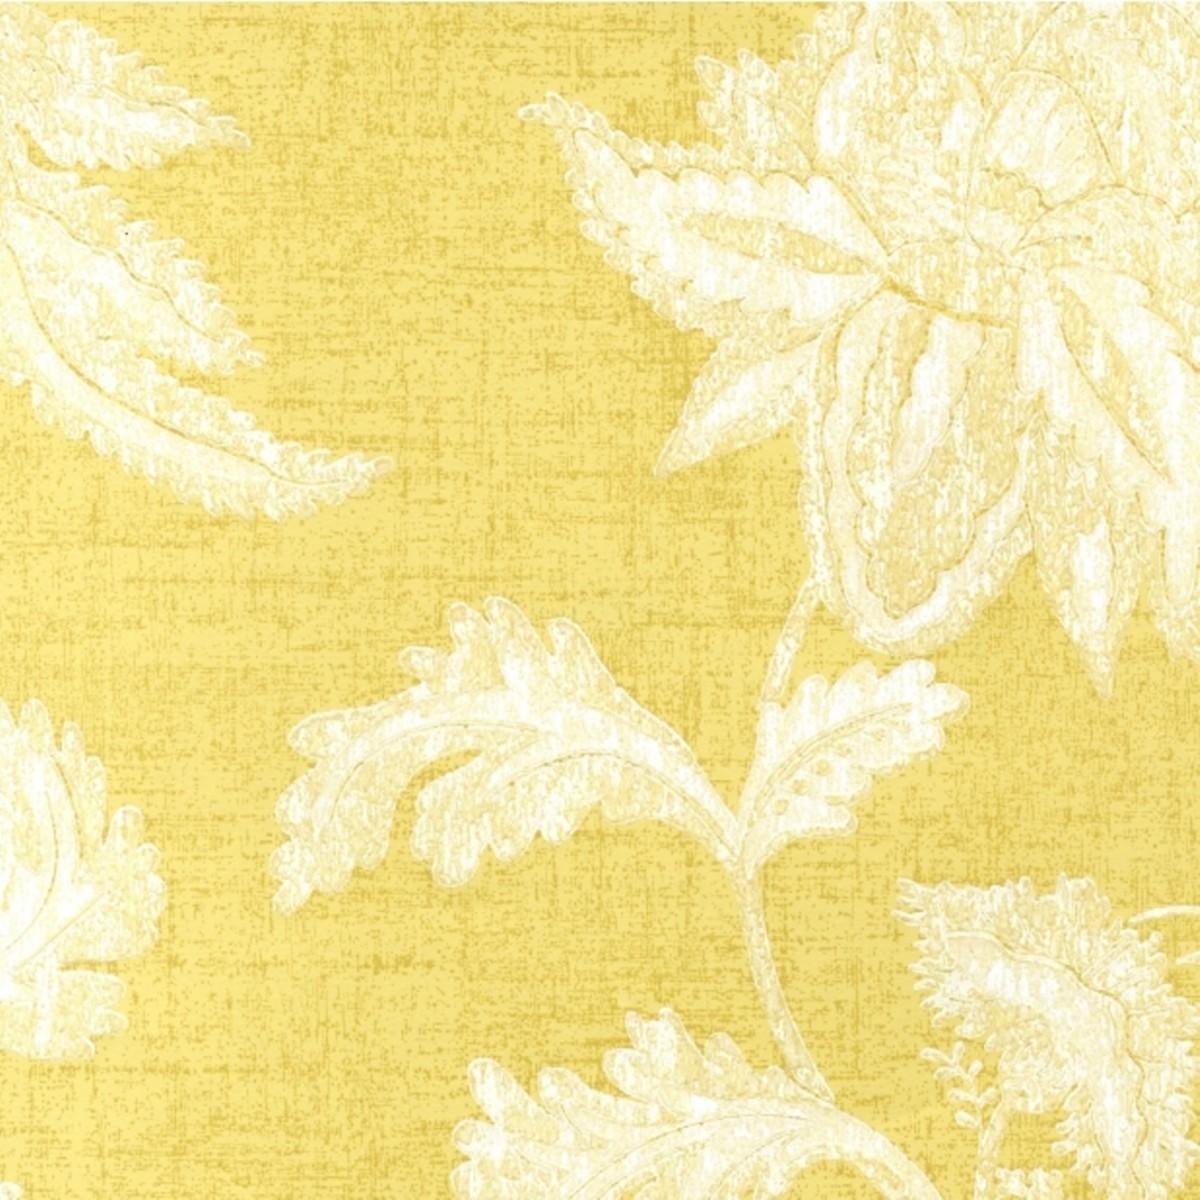 Обои бумажные Ashford House Flowers Special Edition желтые 0.53 м WU0757